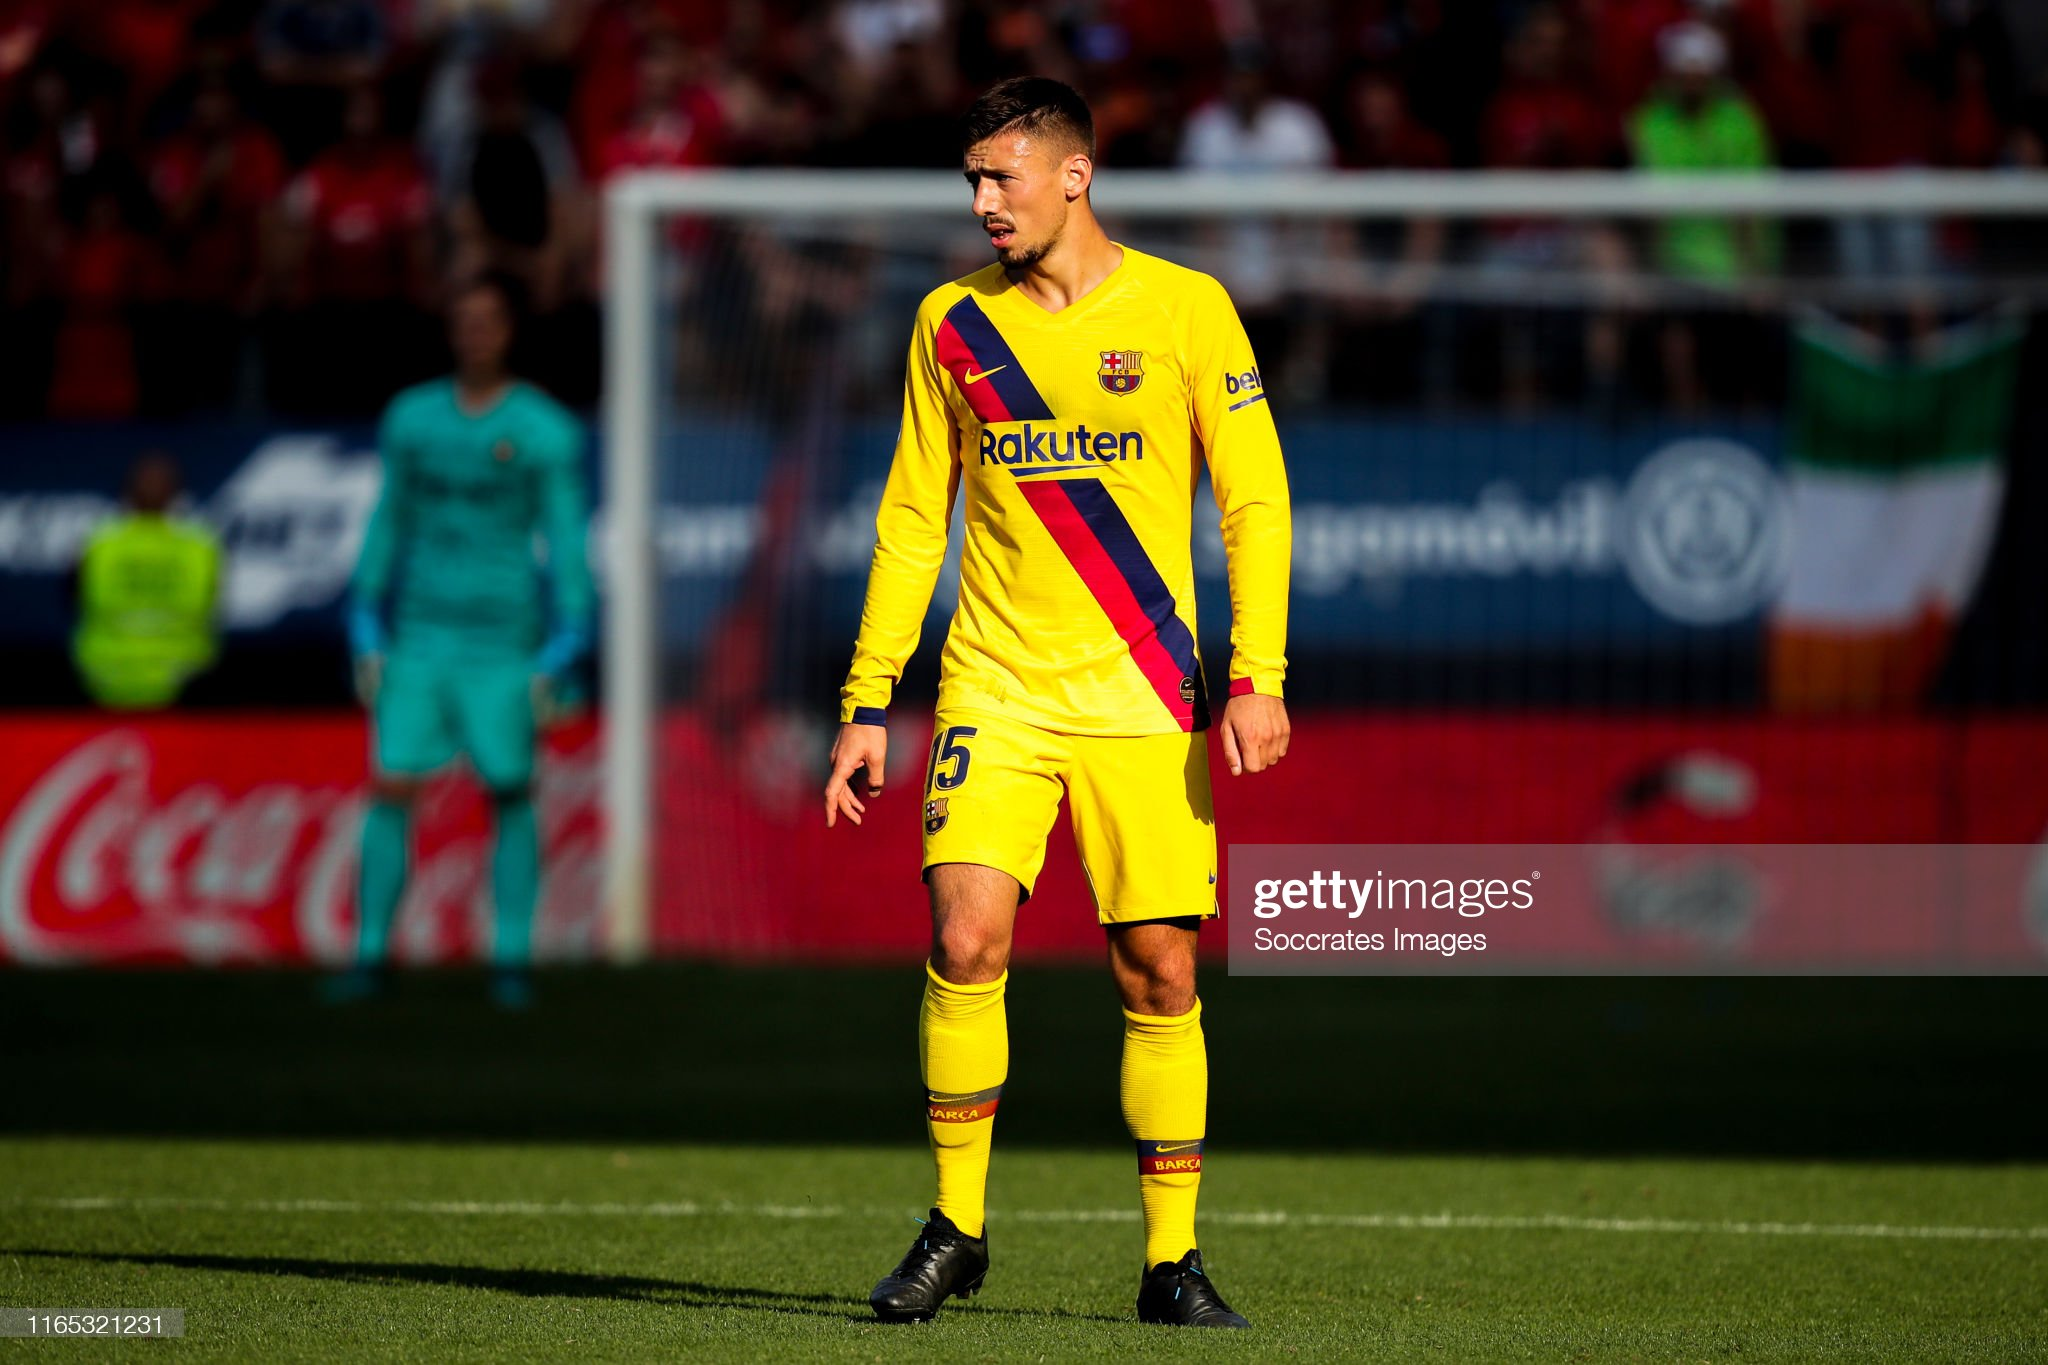 صور مباراة : أوساسونا - برشلونة 2-2 ( 31-08-2019 )  Clement-lenglet-of-fc-barcelona-during-the-la-liga-santander-match-picture-id1165321231?s=2048x2048